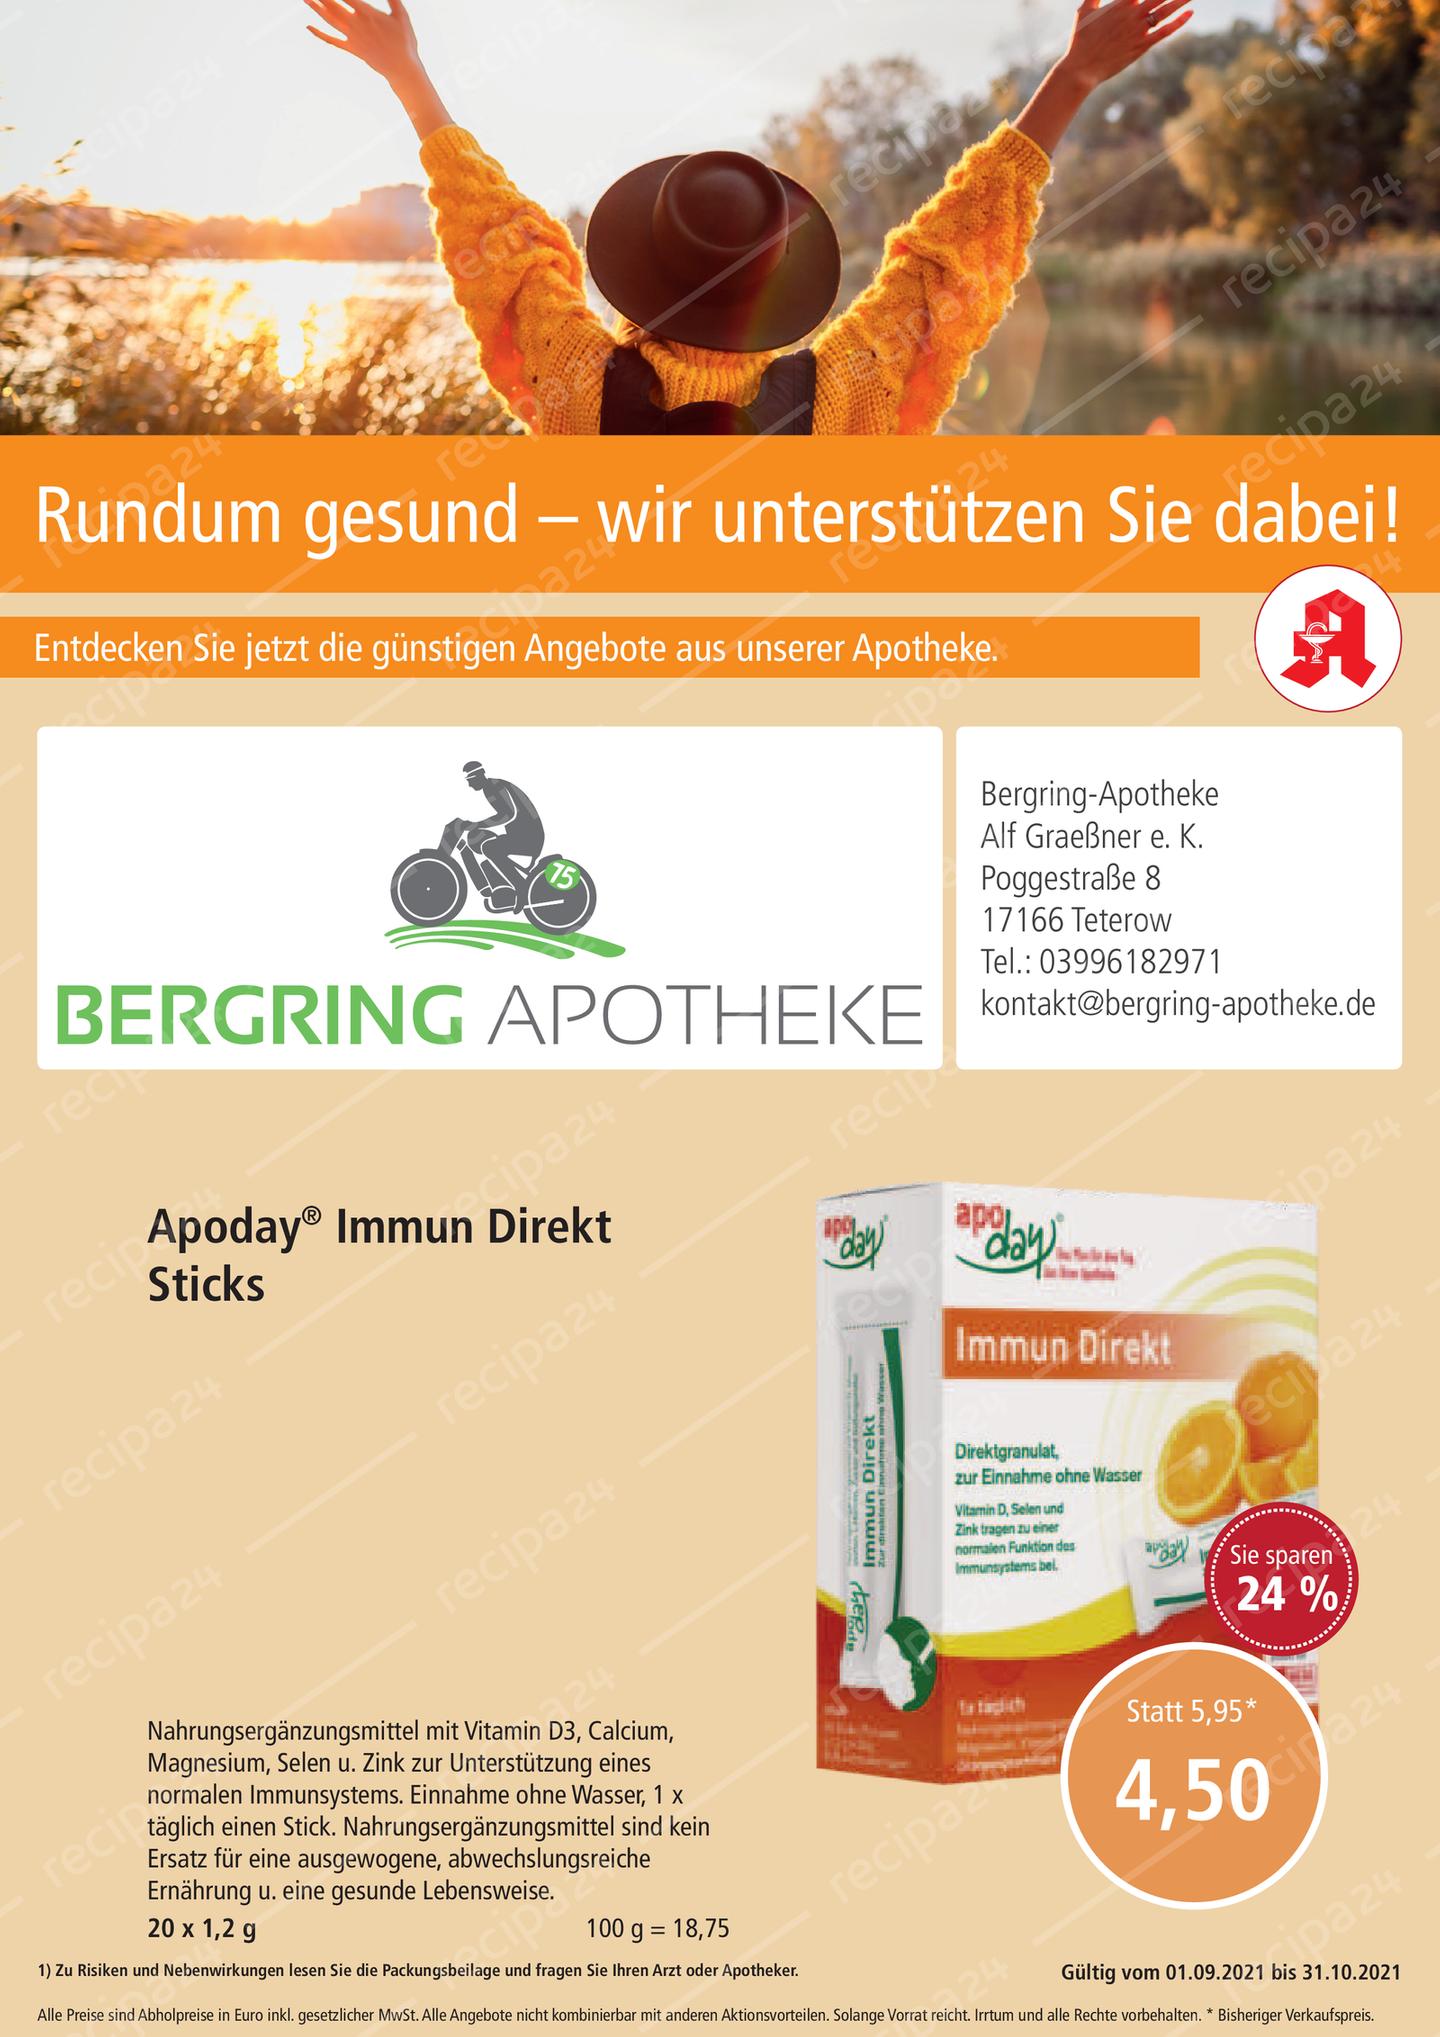 Aktionsflyer der Bergring-Apotheke